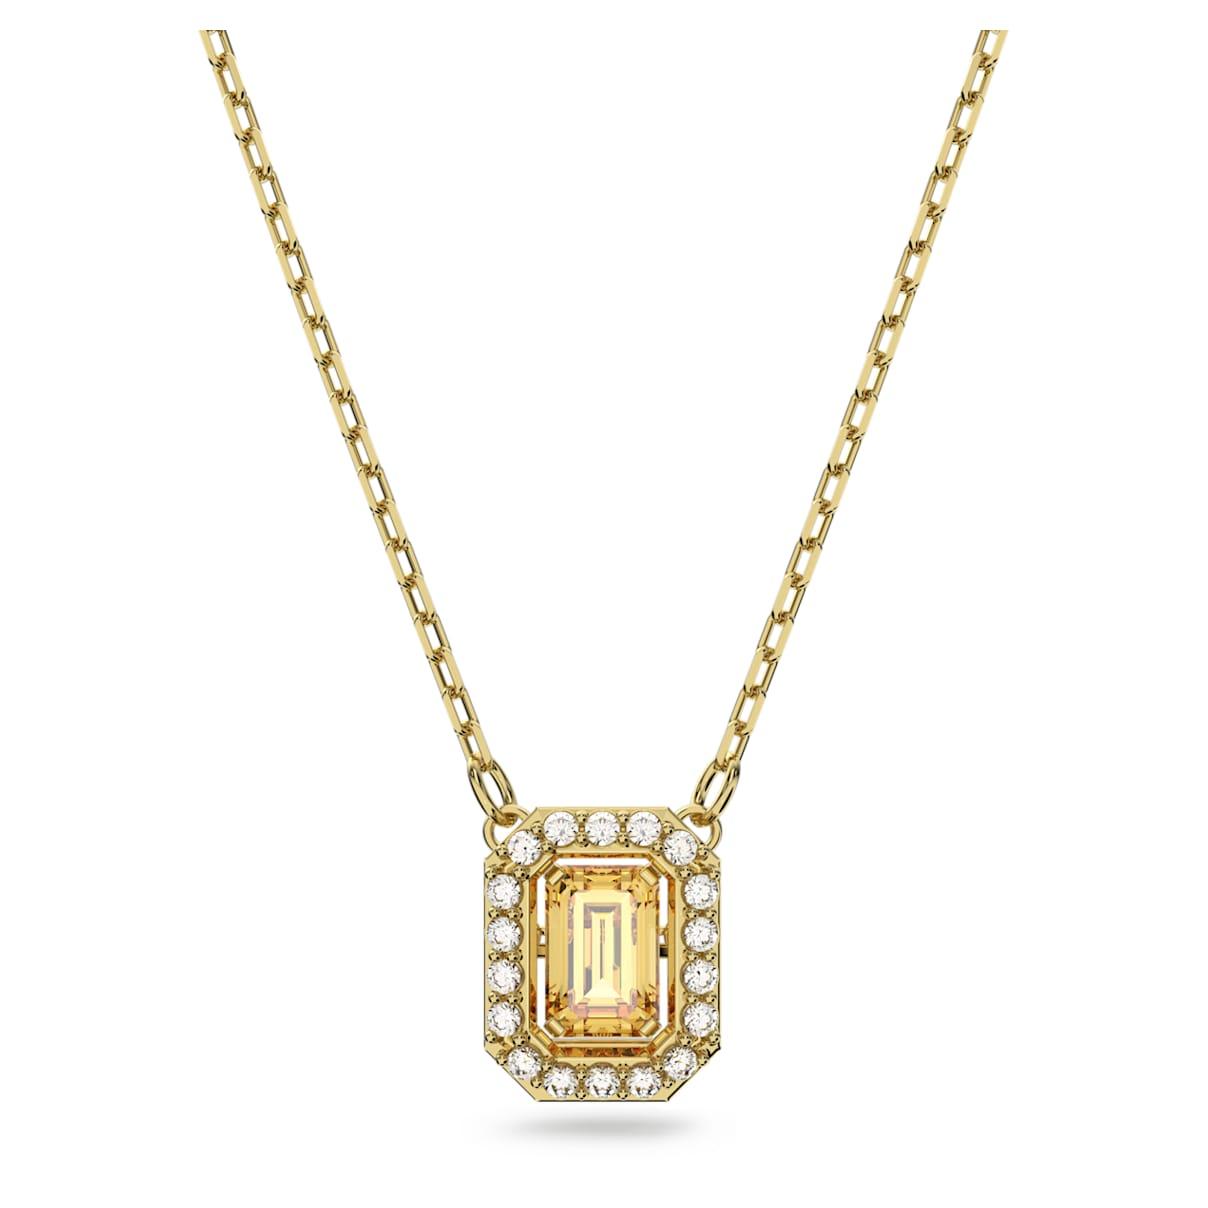 Millenia necklace, Square Swarovski zirconia, Yellow, Gold-tone plated